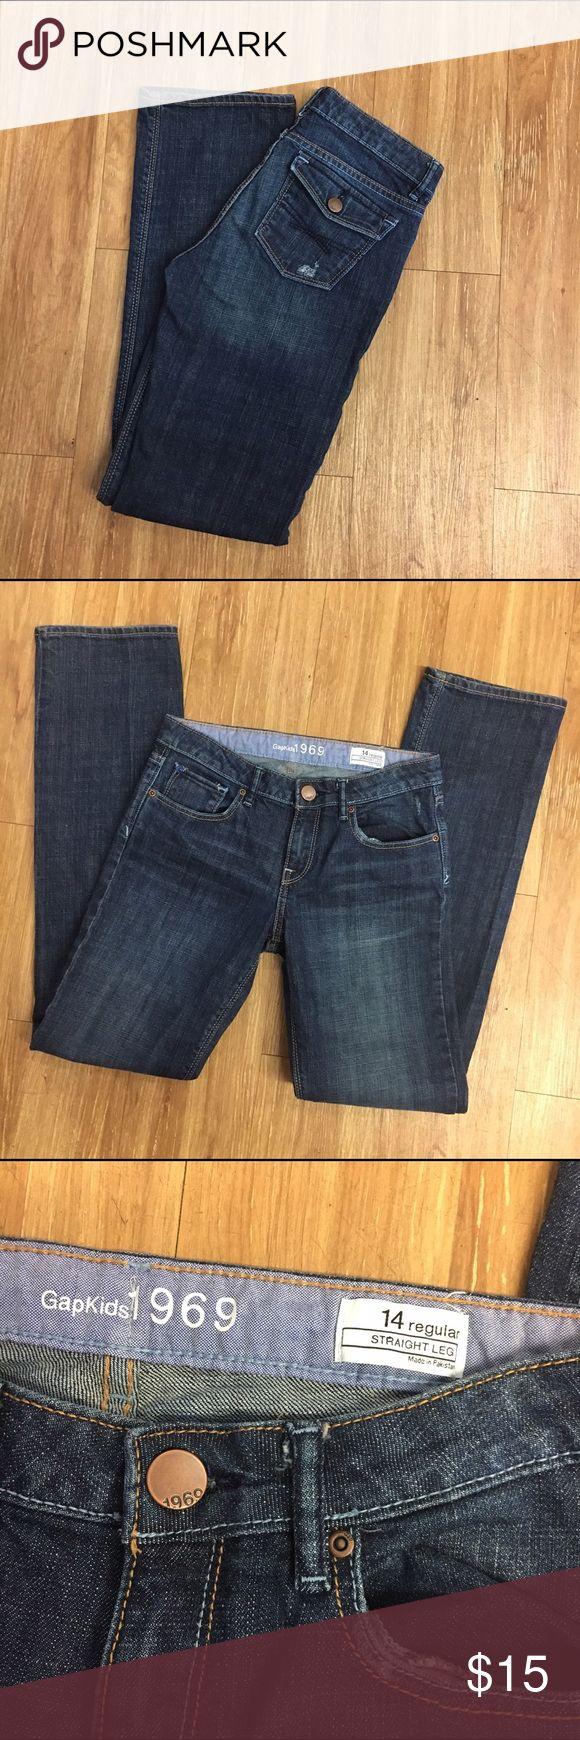 "Gap Jeans Girls 14 Straight Leg Regular Gap Jeans Girls 14 Straight Leg Regular  Great condition.  Factory distressed, lightly.    Length: 37.5"" Inseam: 30""  All measurements approximate.  #jeans #denim #straightleg #gap #gapjeans #blue GAP Bottoms Jeans"